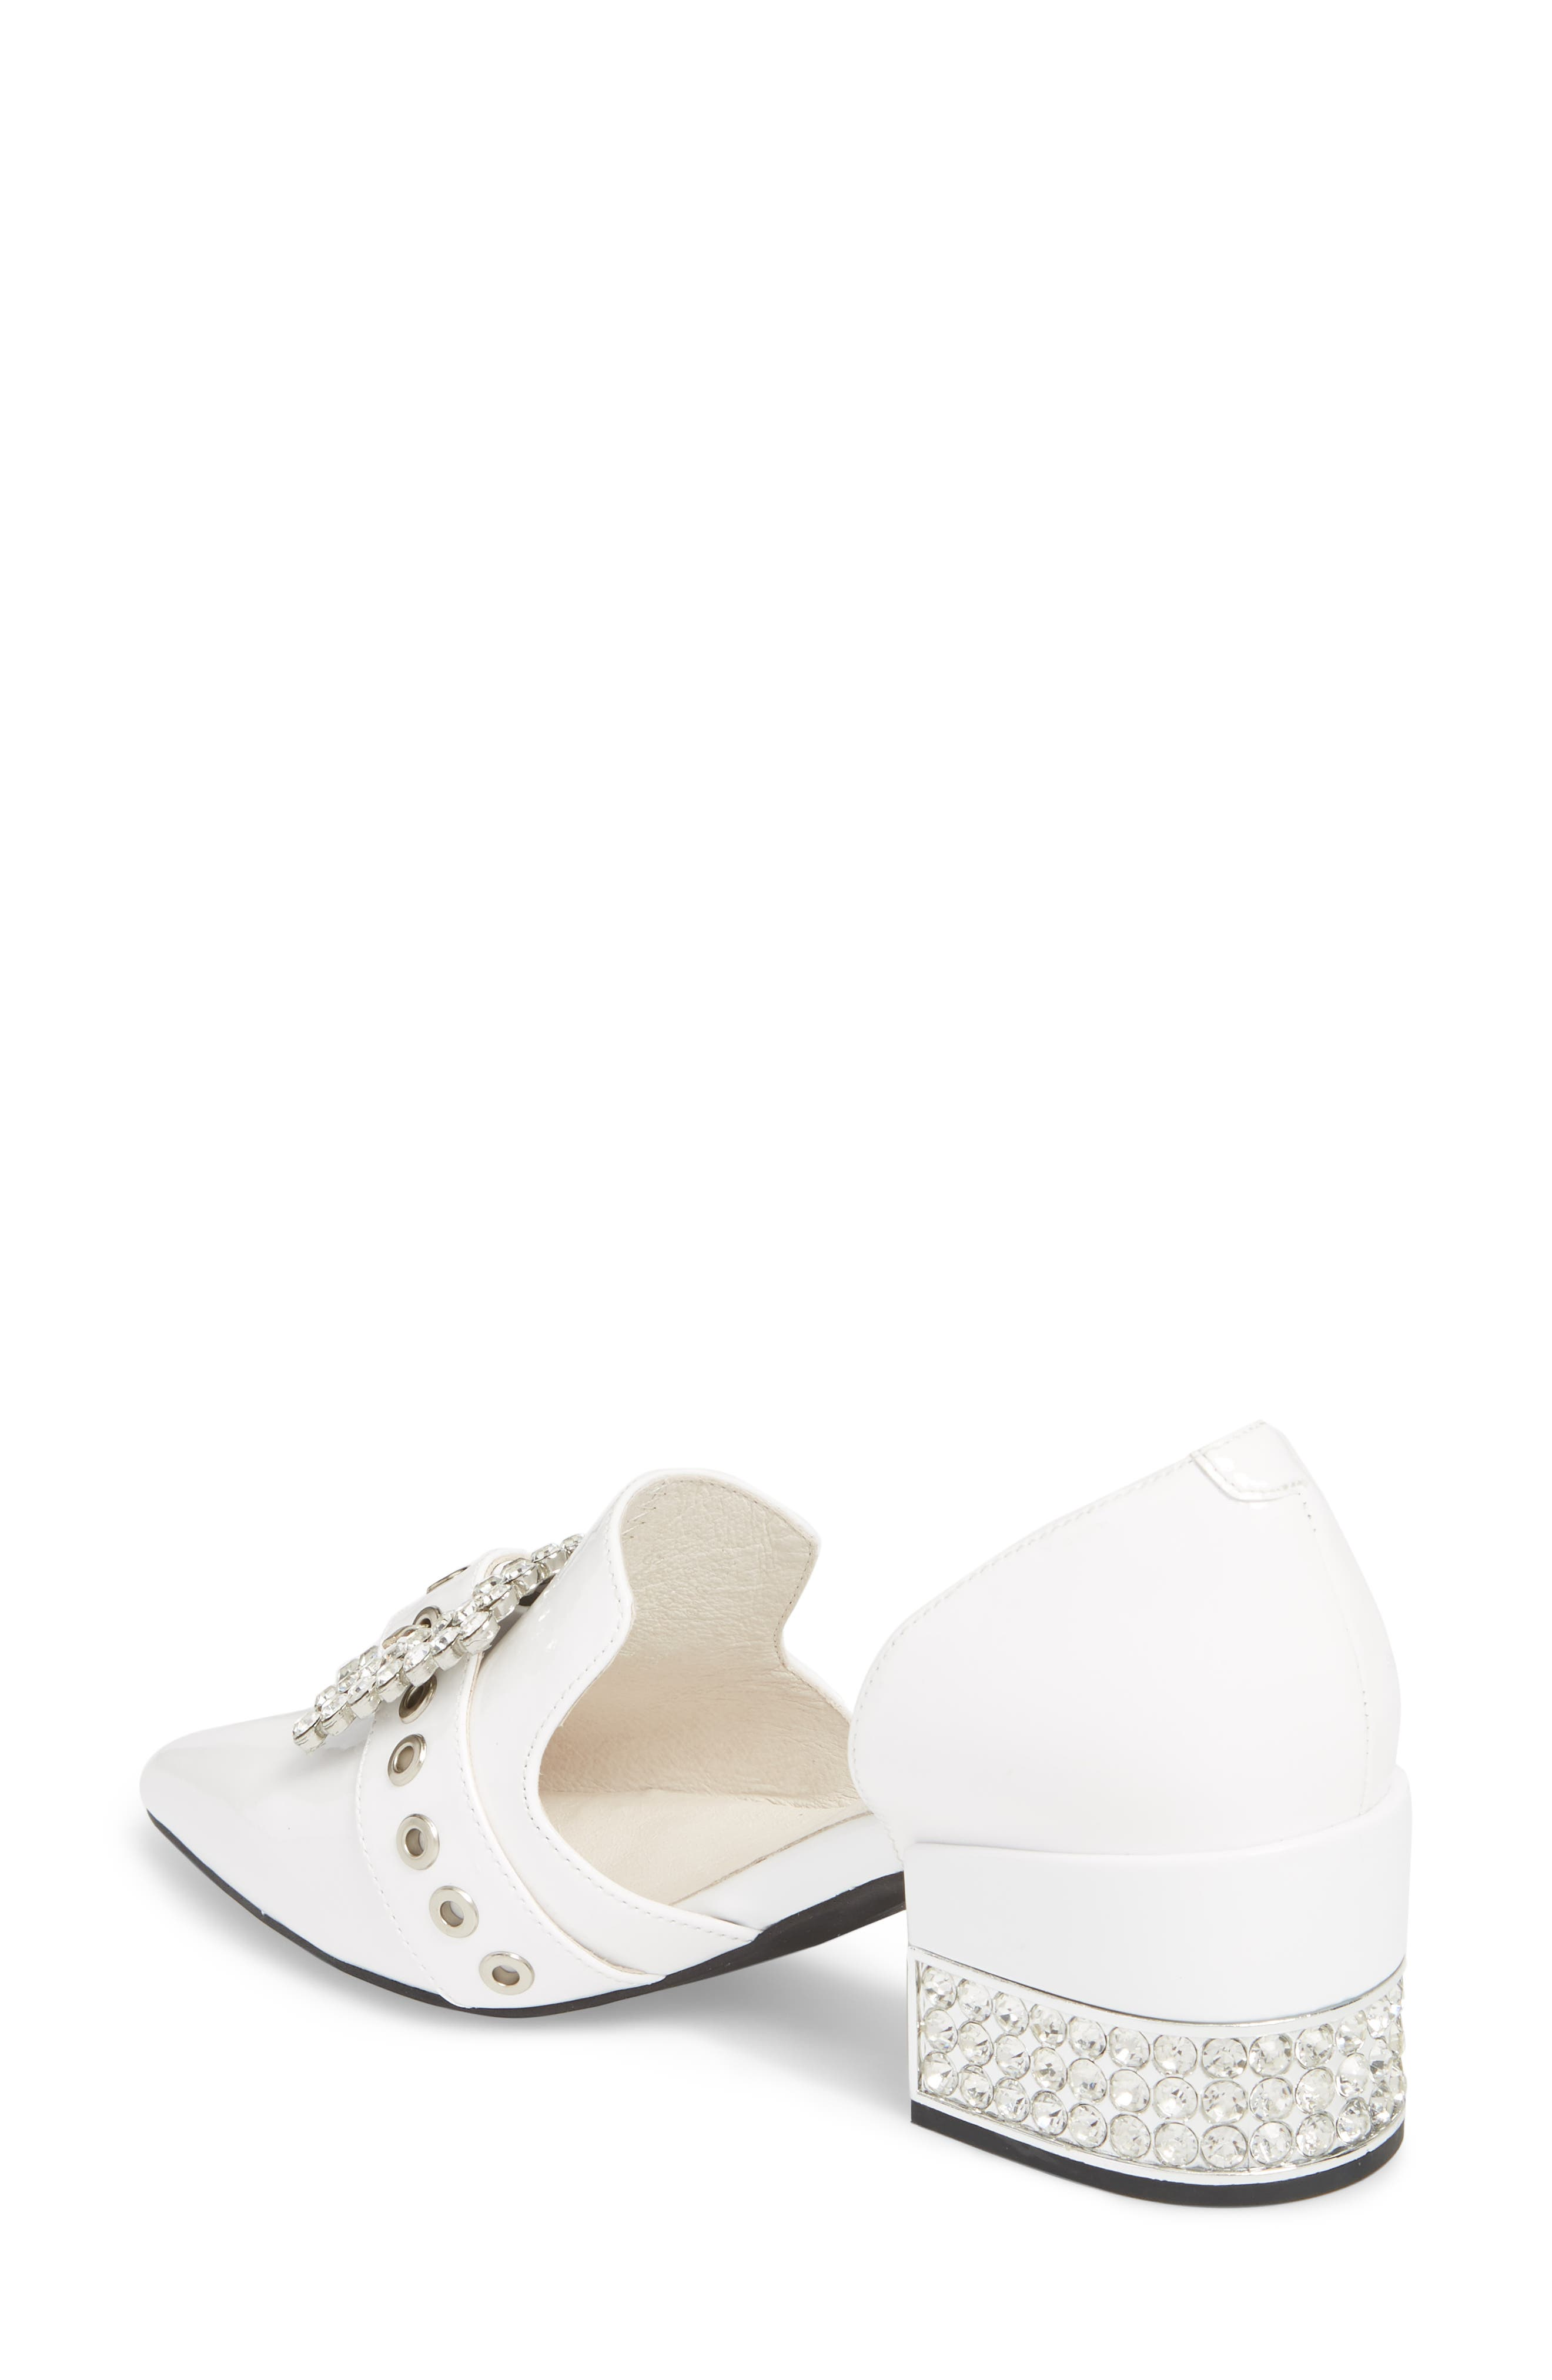 Zofia Jeweled Heel Pump,                             Alternate thumbnail 2, color,                             White Patent Silver